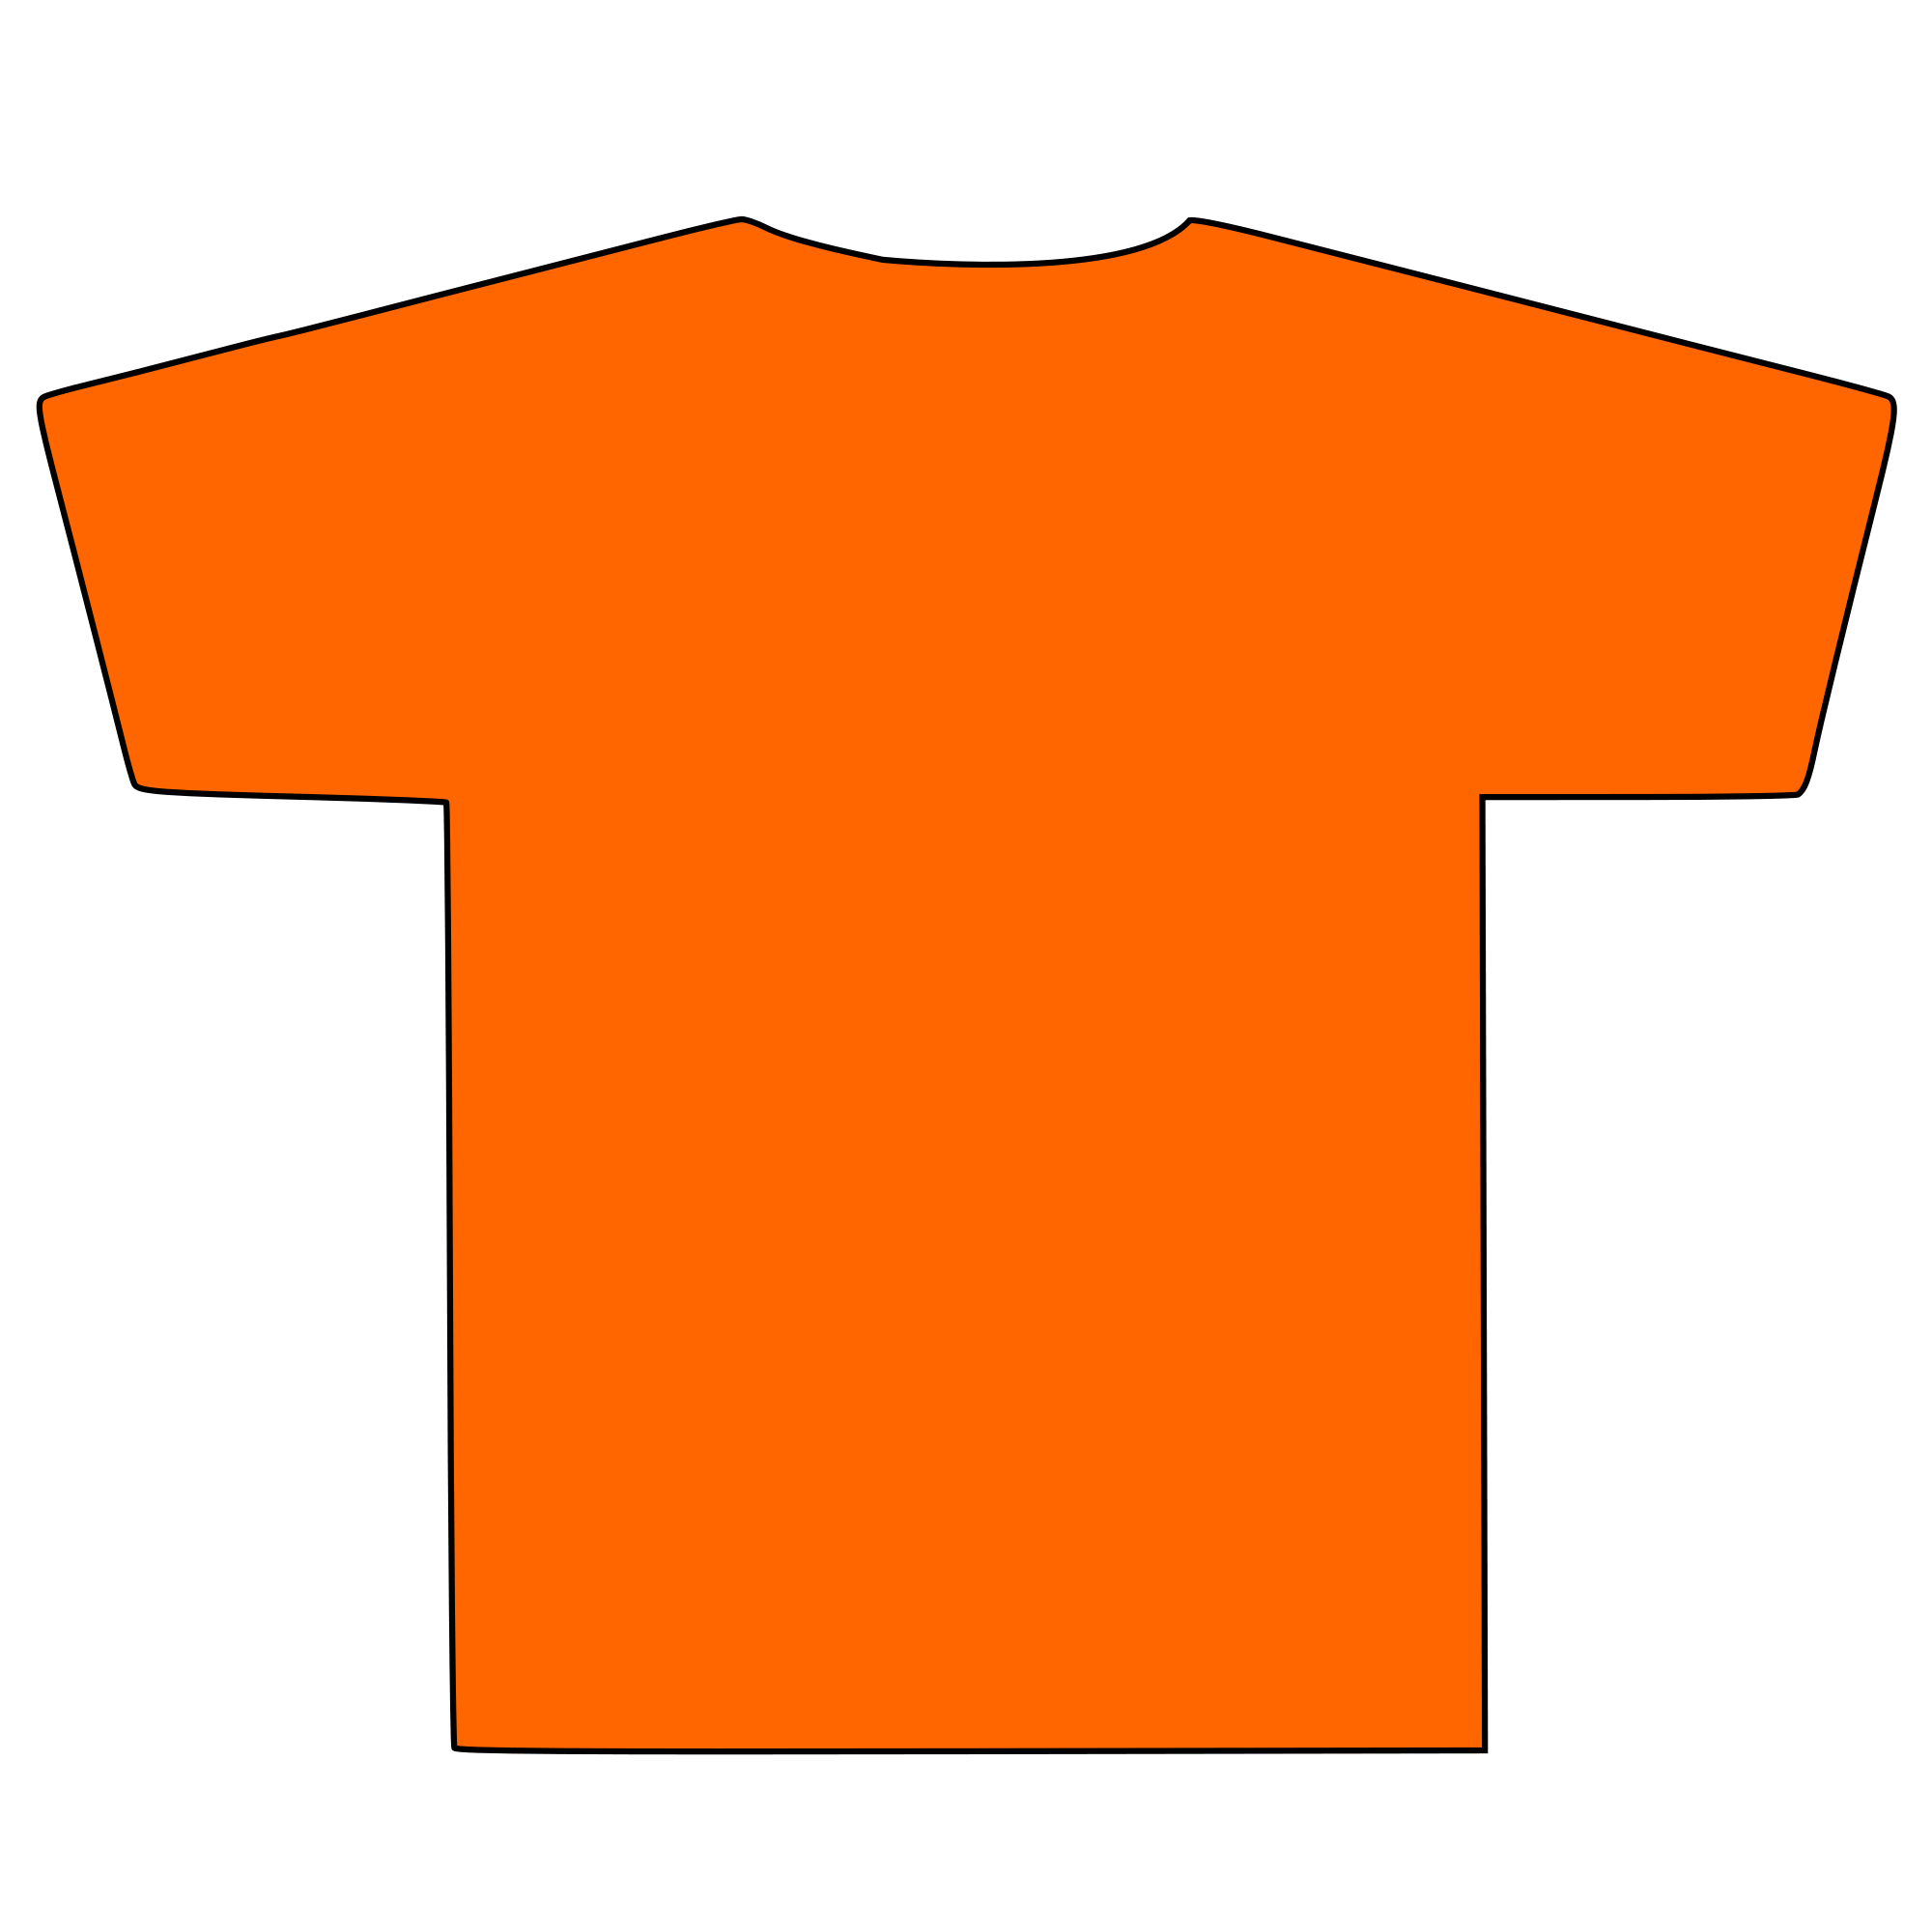 Clipart shirt orange shirt. T silhouette clip art